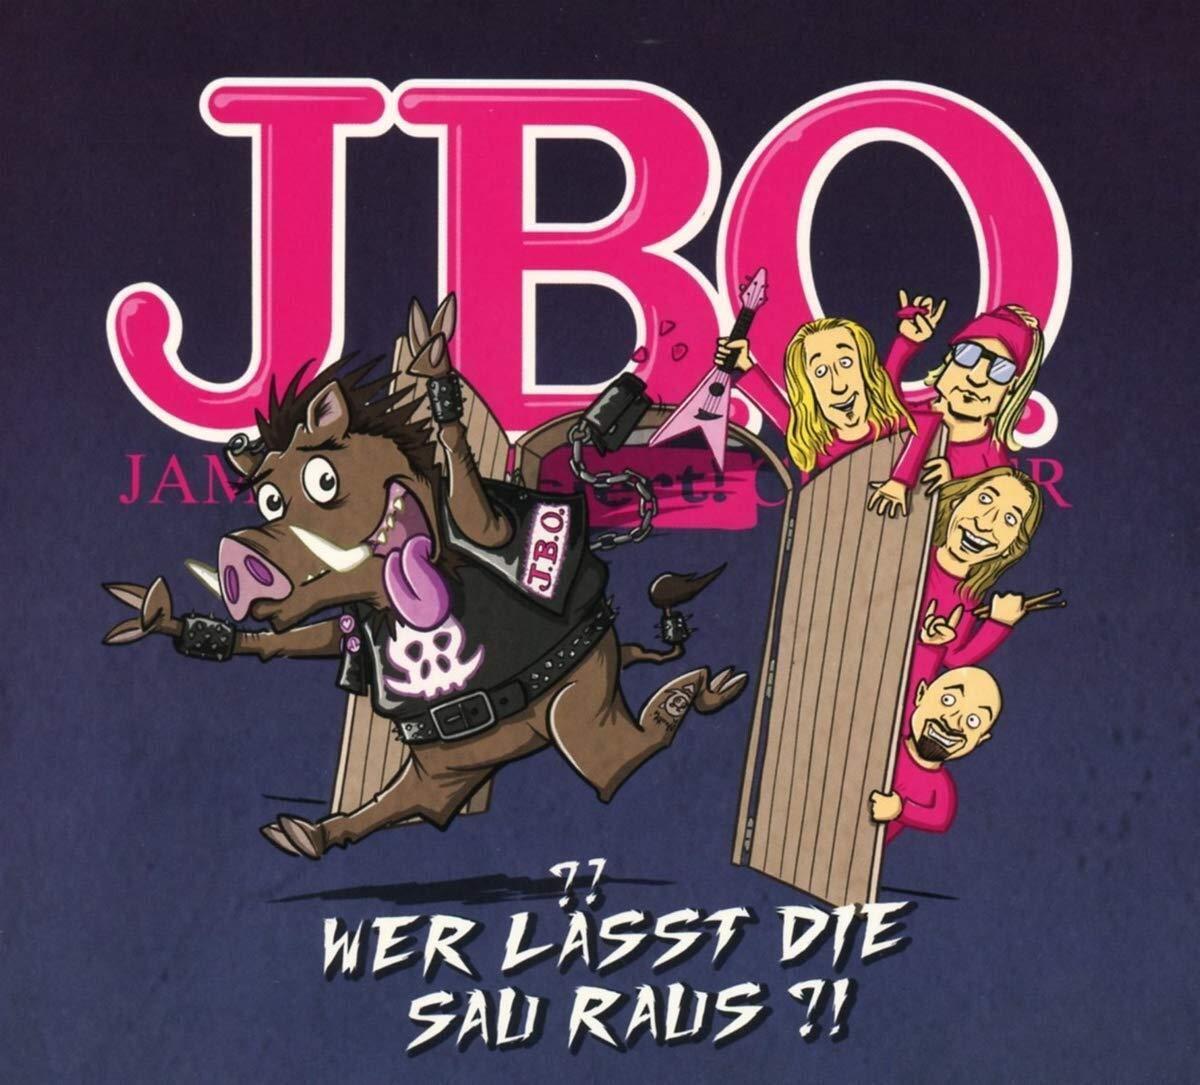 J.B.O. - Wer Lässt die Sau Raus?! (Digipak)